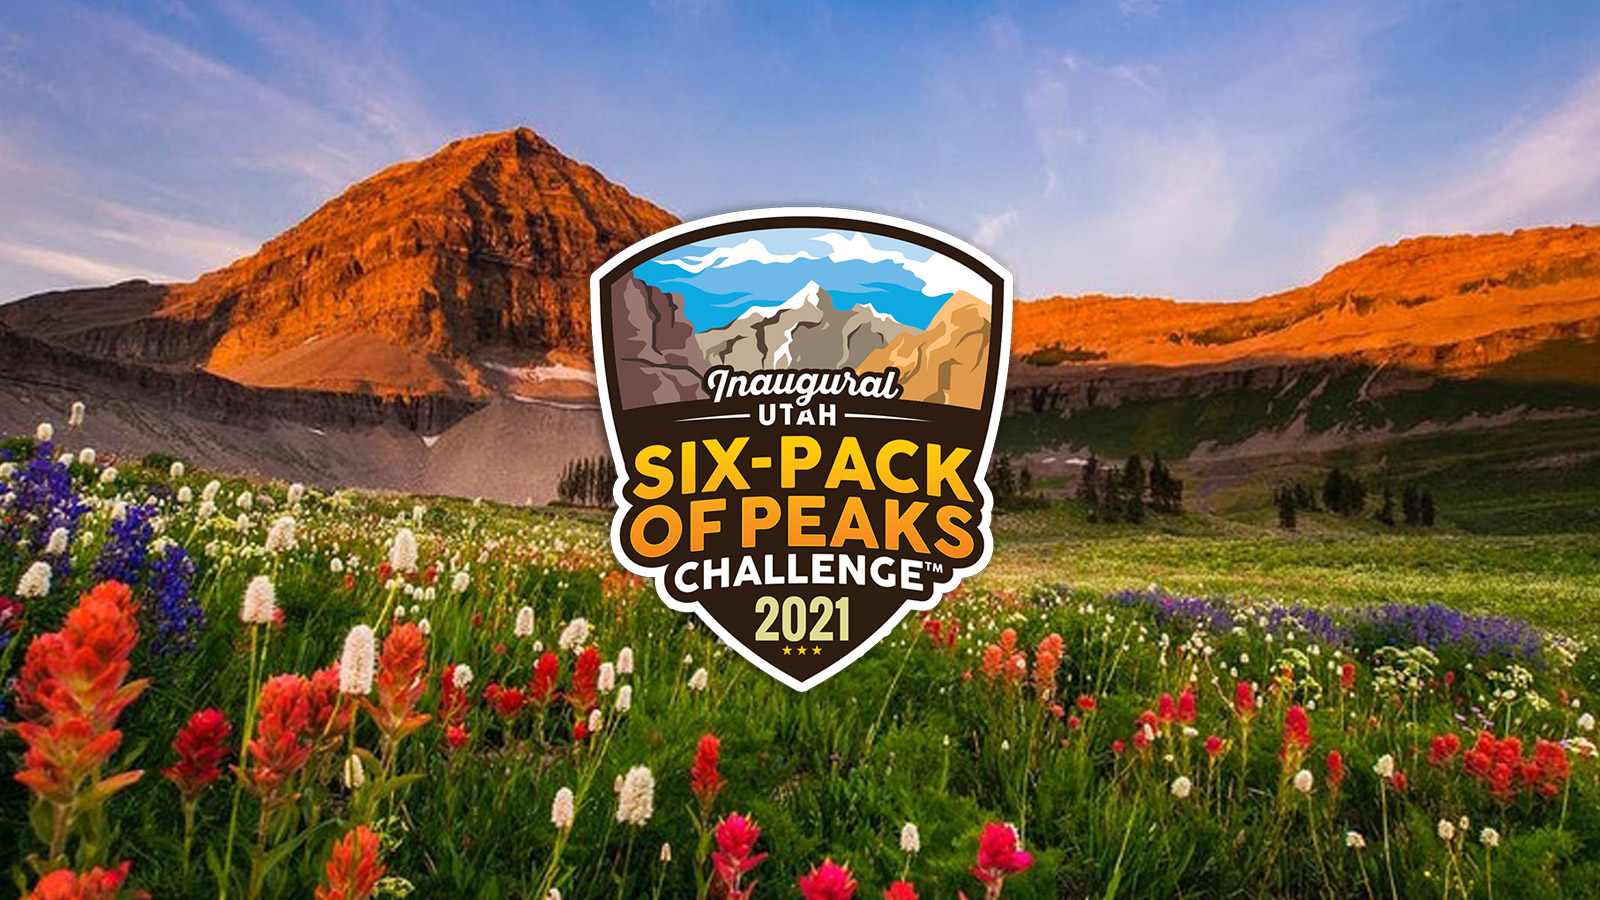 2021 Utah Six-Pack of Peaks Challenge Discussion Forum